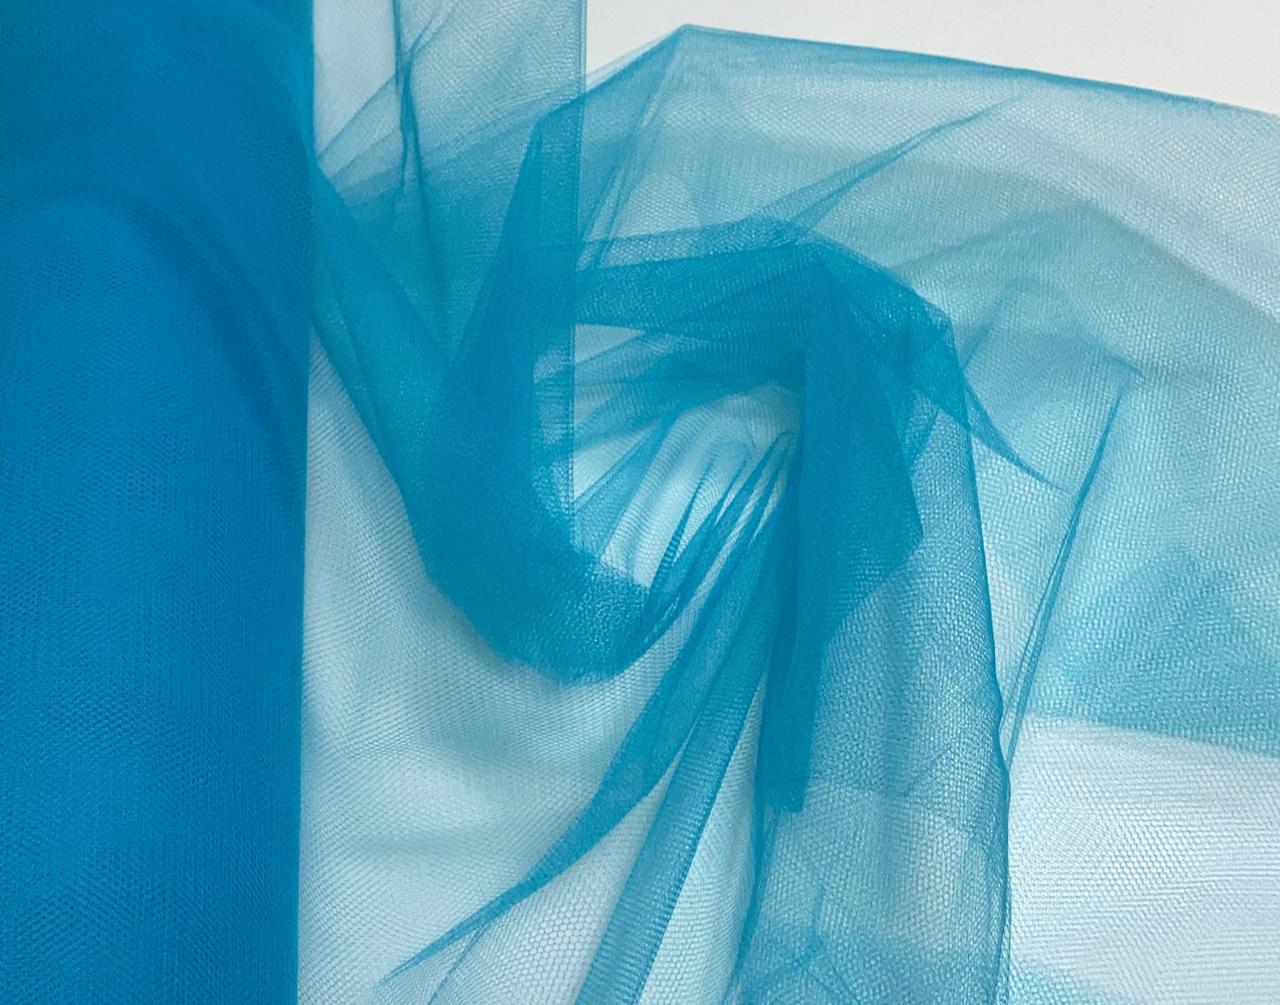 Tule Liso Decoração 1,20m Largura Azul Turquesa